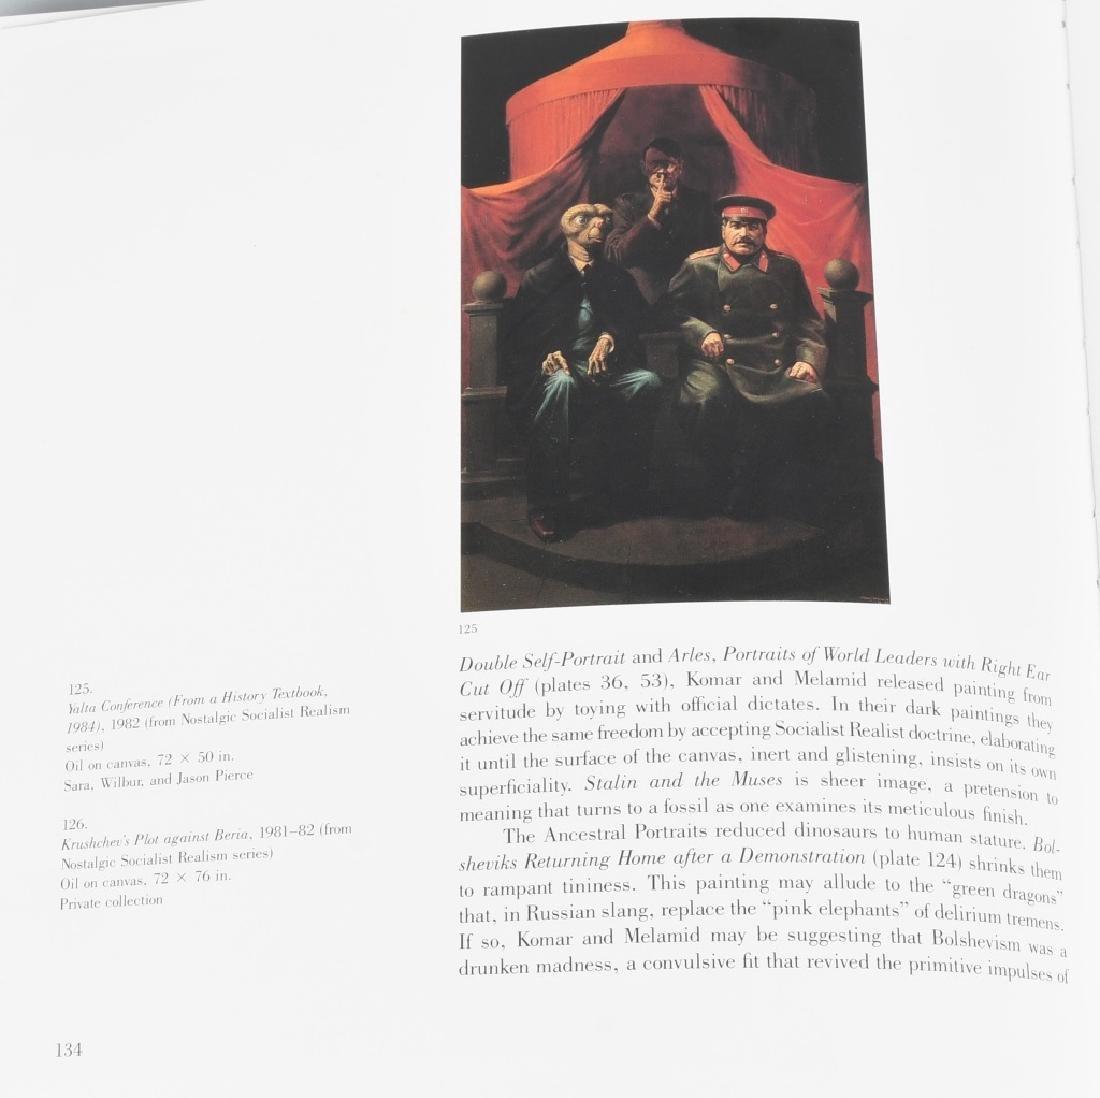 KOMAR & MELAMID YALTA CONFERENCE PAINTING 1982 - 6